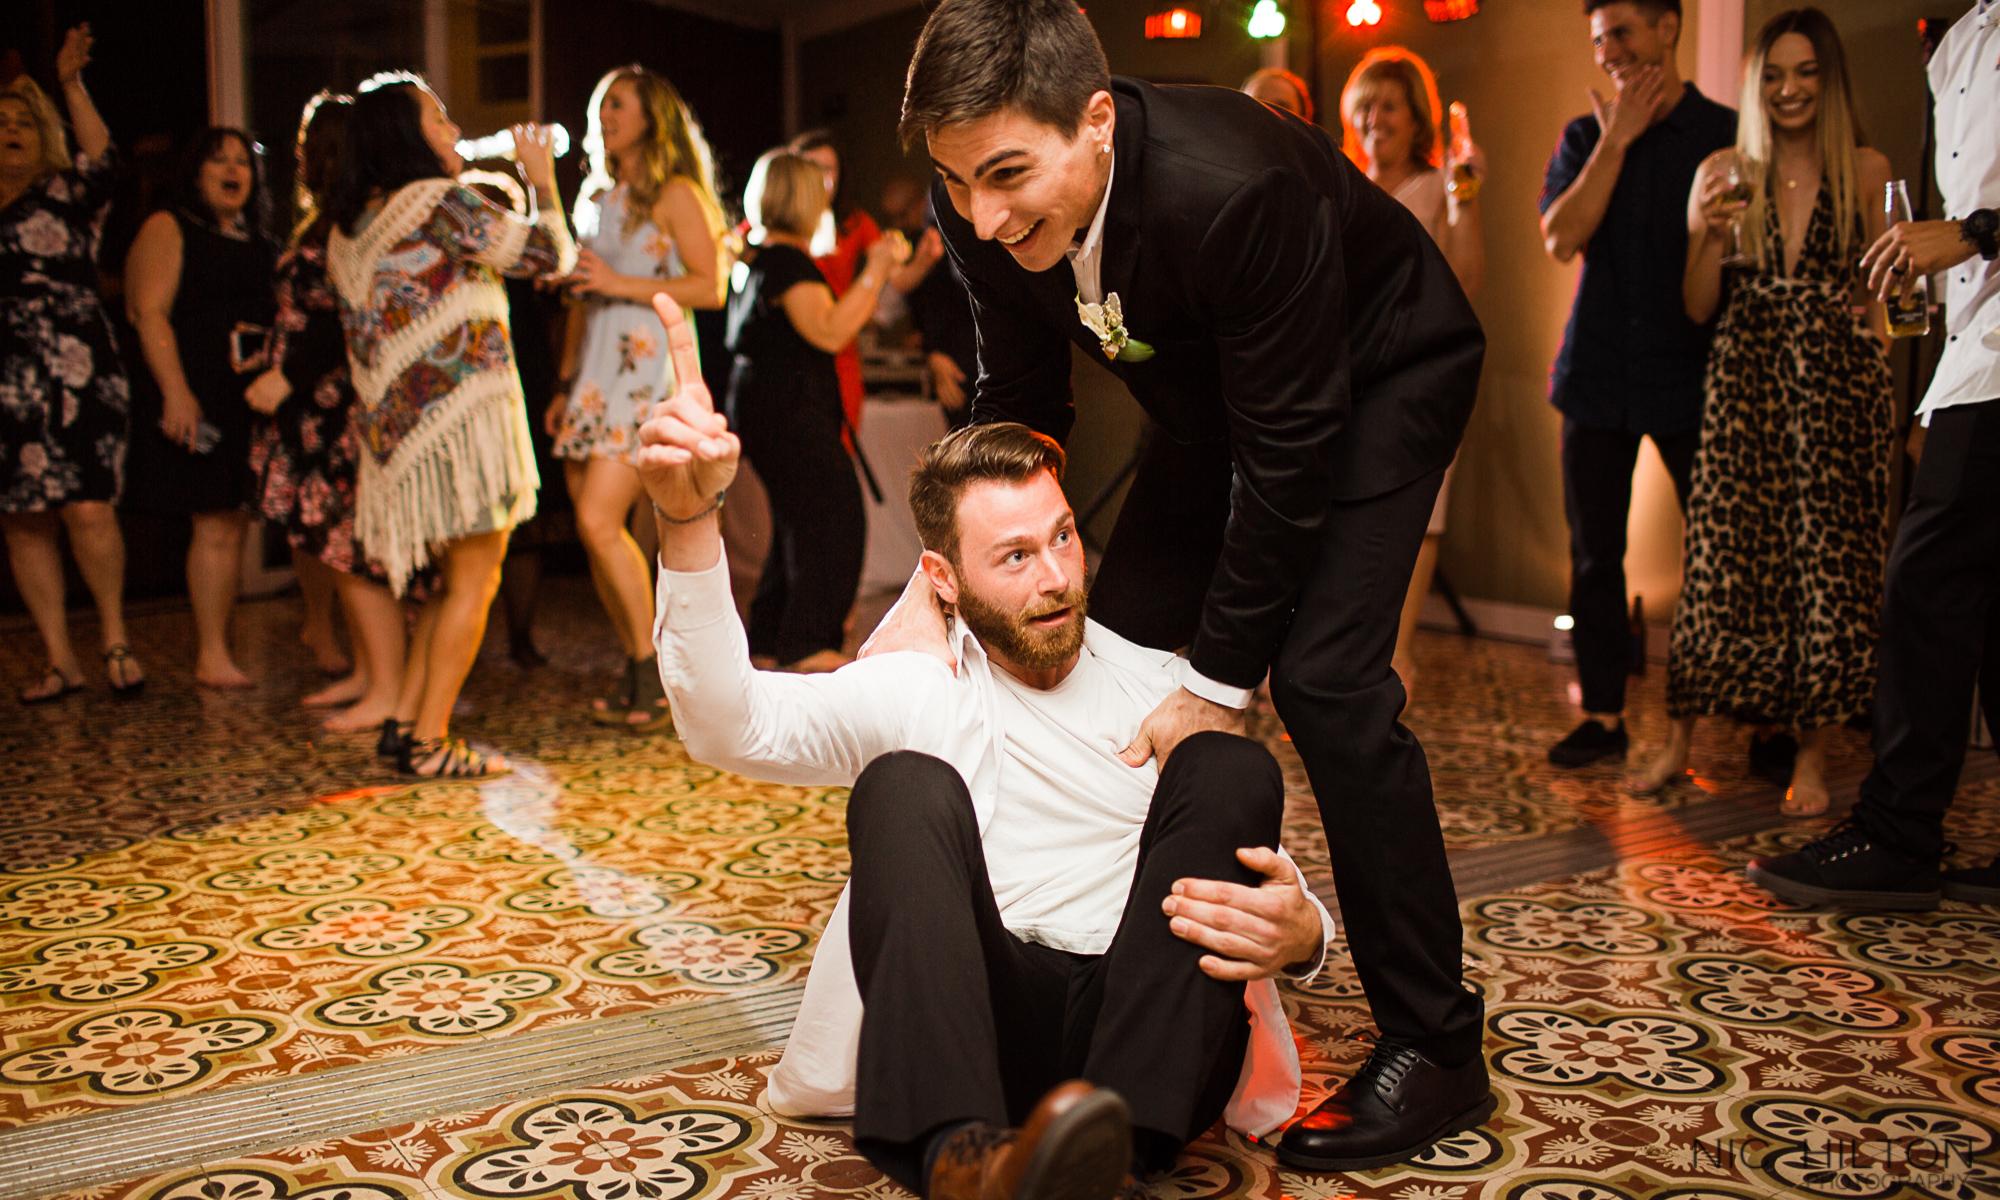 Groom-And-Best-Man-Dance-Long-Beach-Wedding.jpg